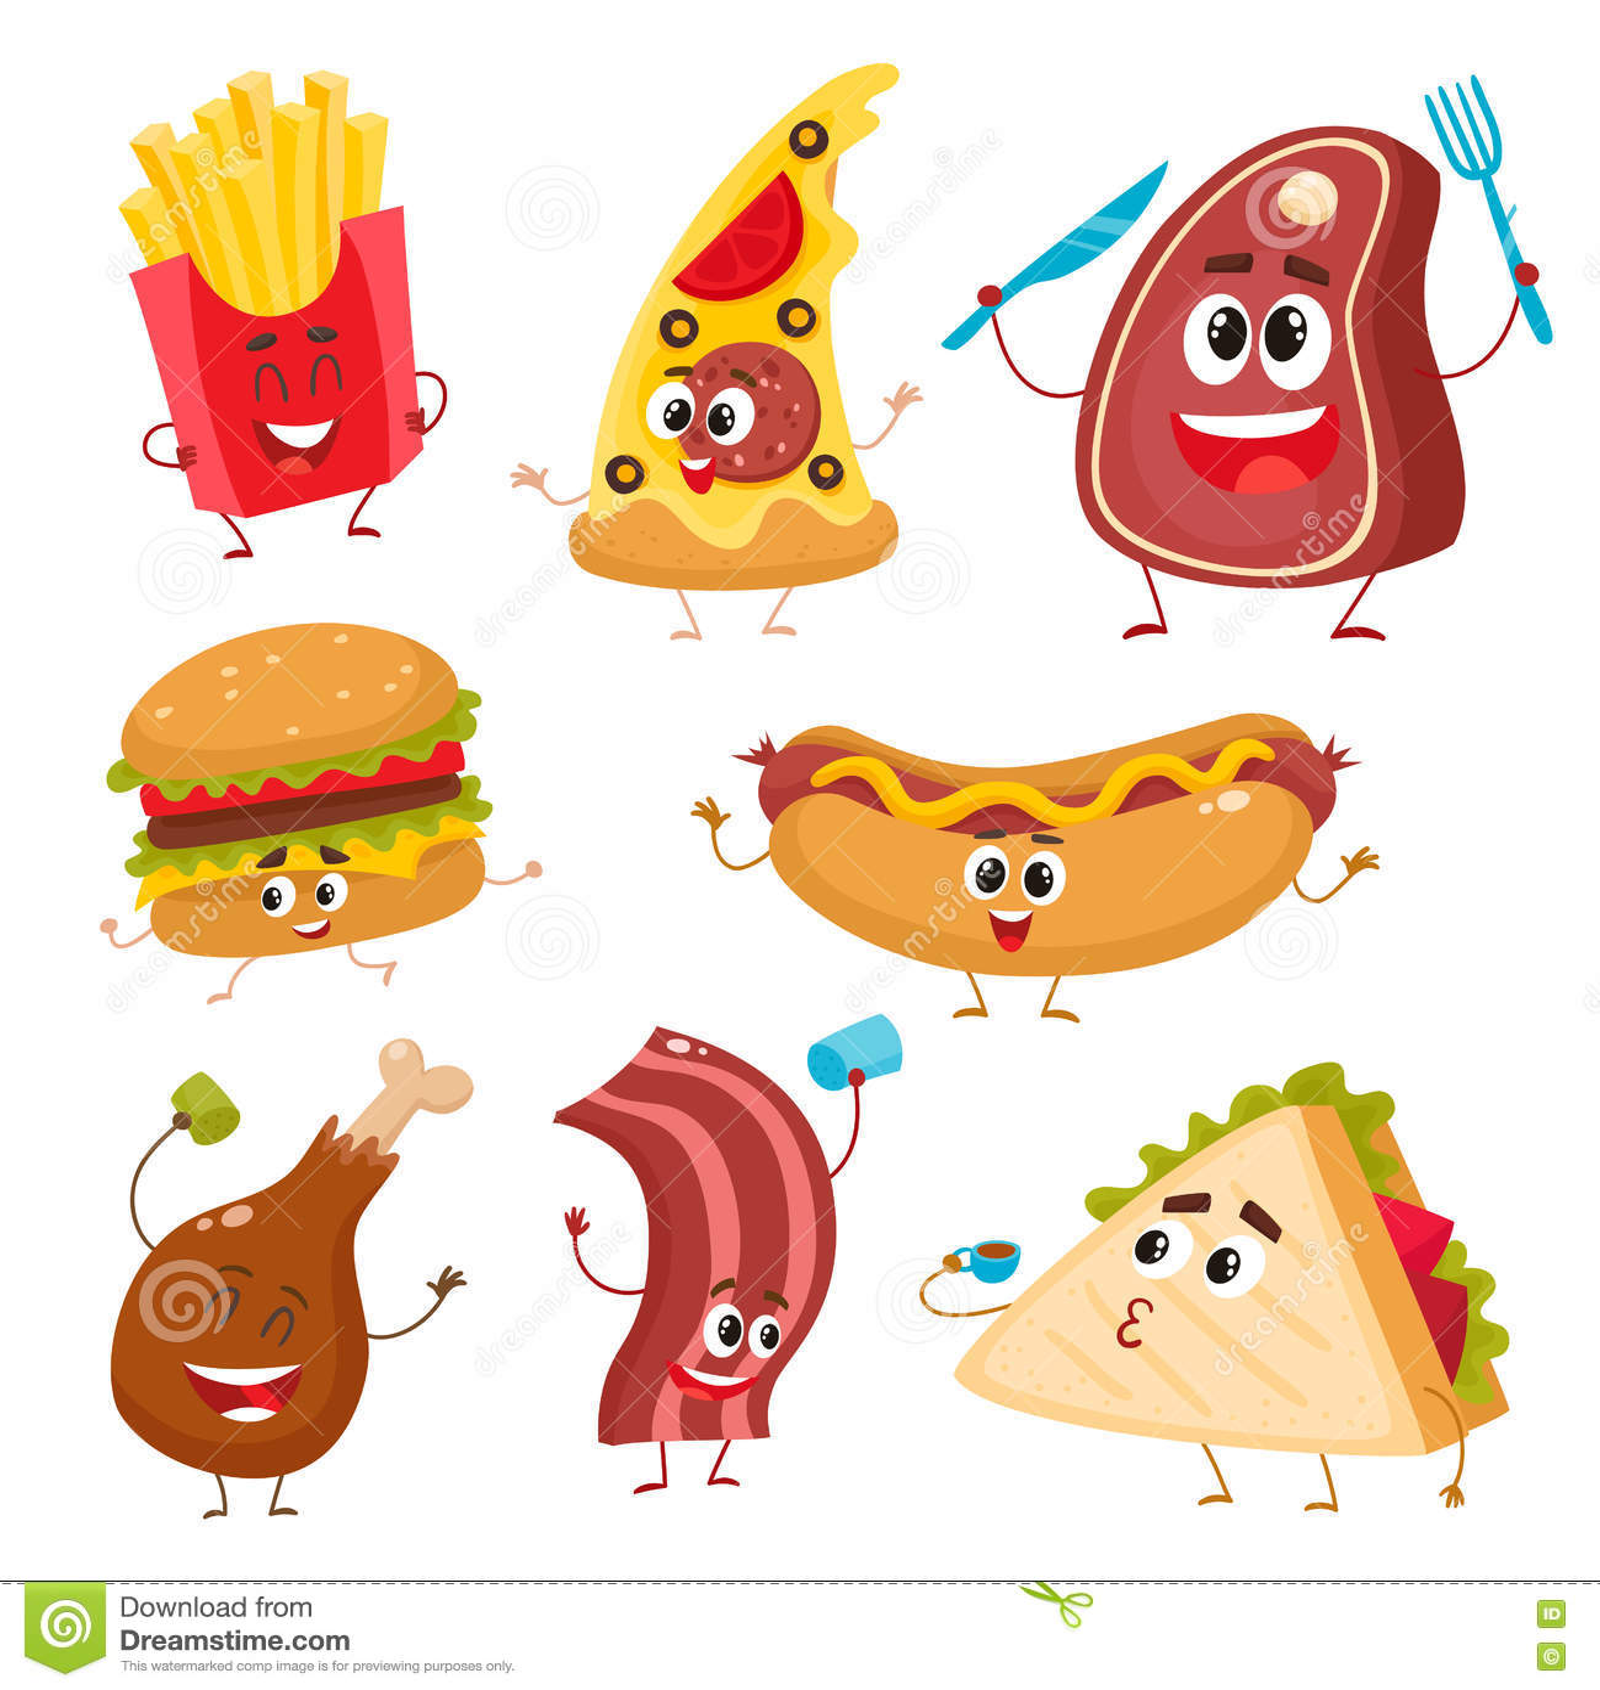 Cute cartoon chicken food - photo#8